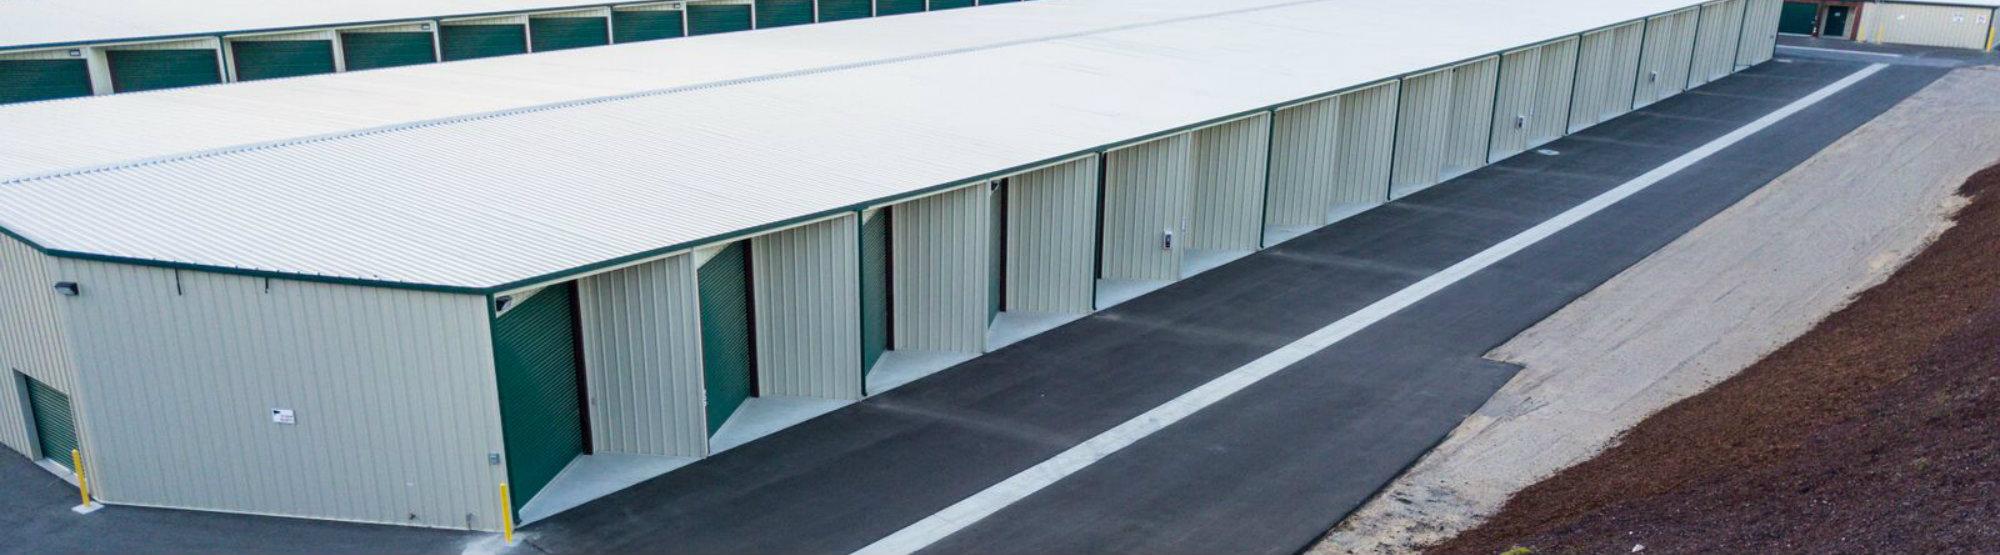 Monarch Mega Storage Unit Exterior